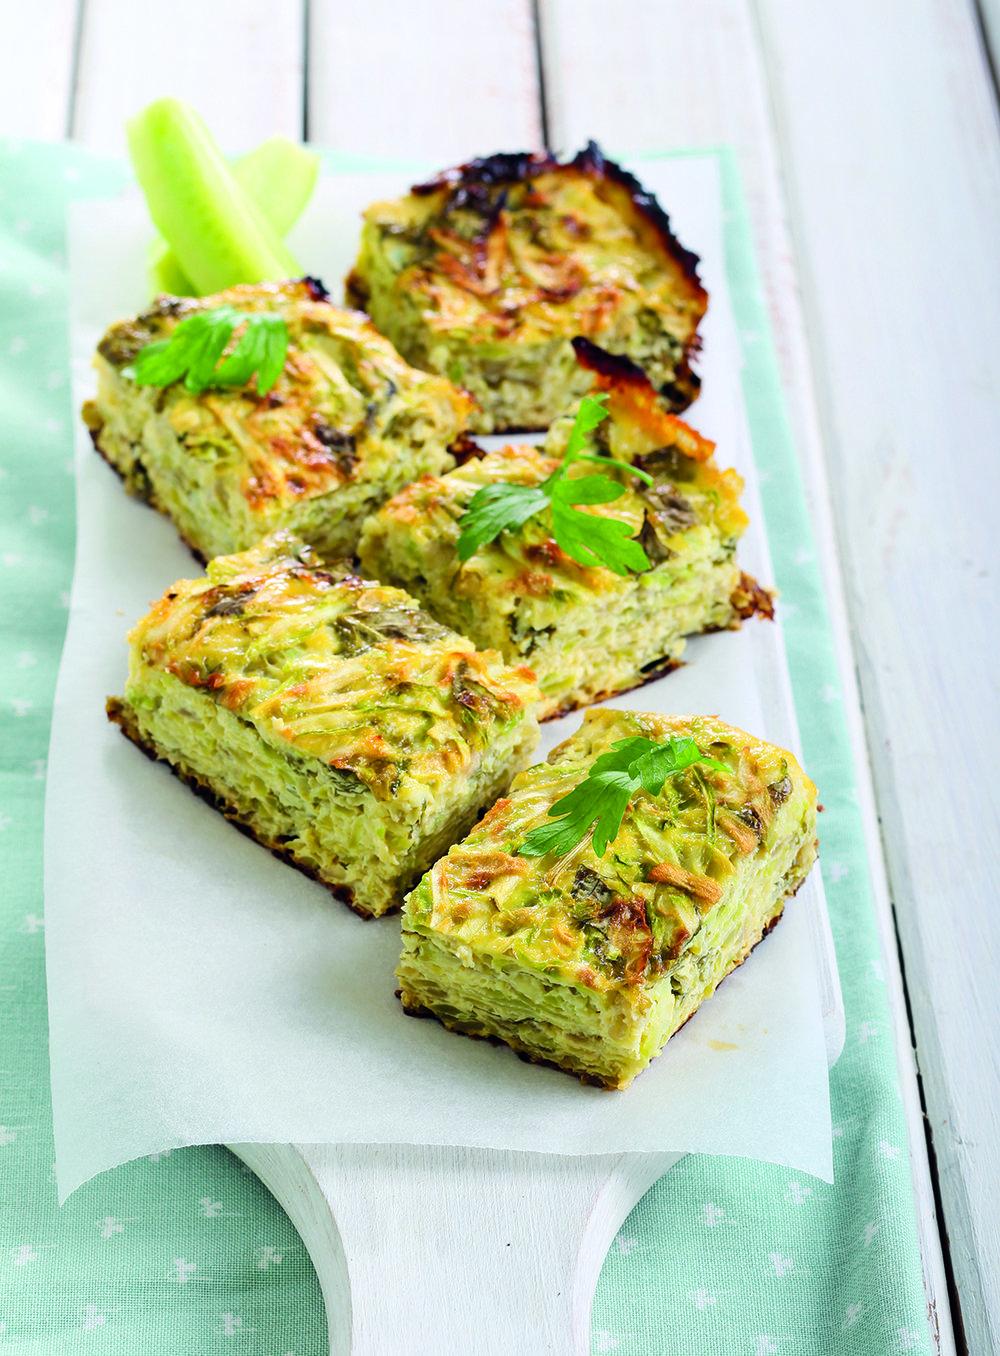 Green Eggs & Ham frittata from The Friendliest Lunchbox Book